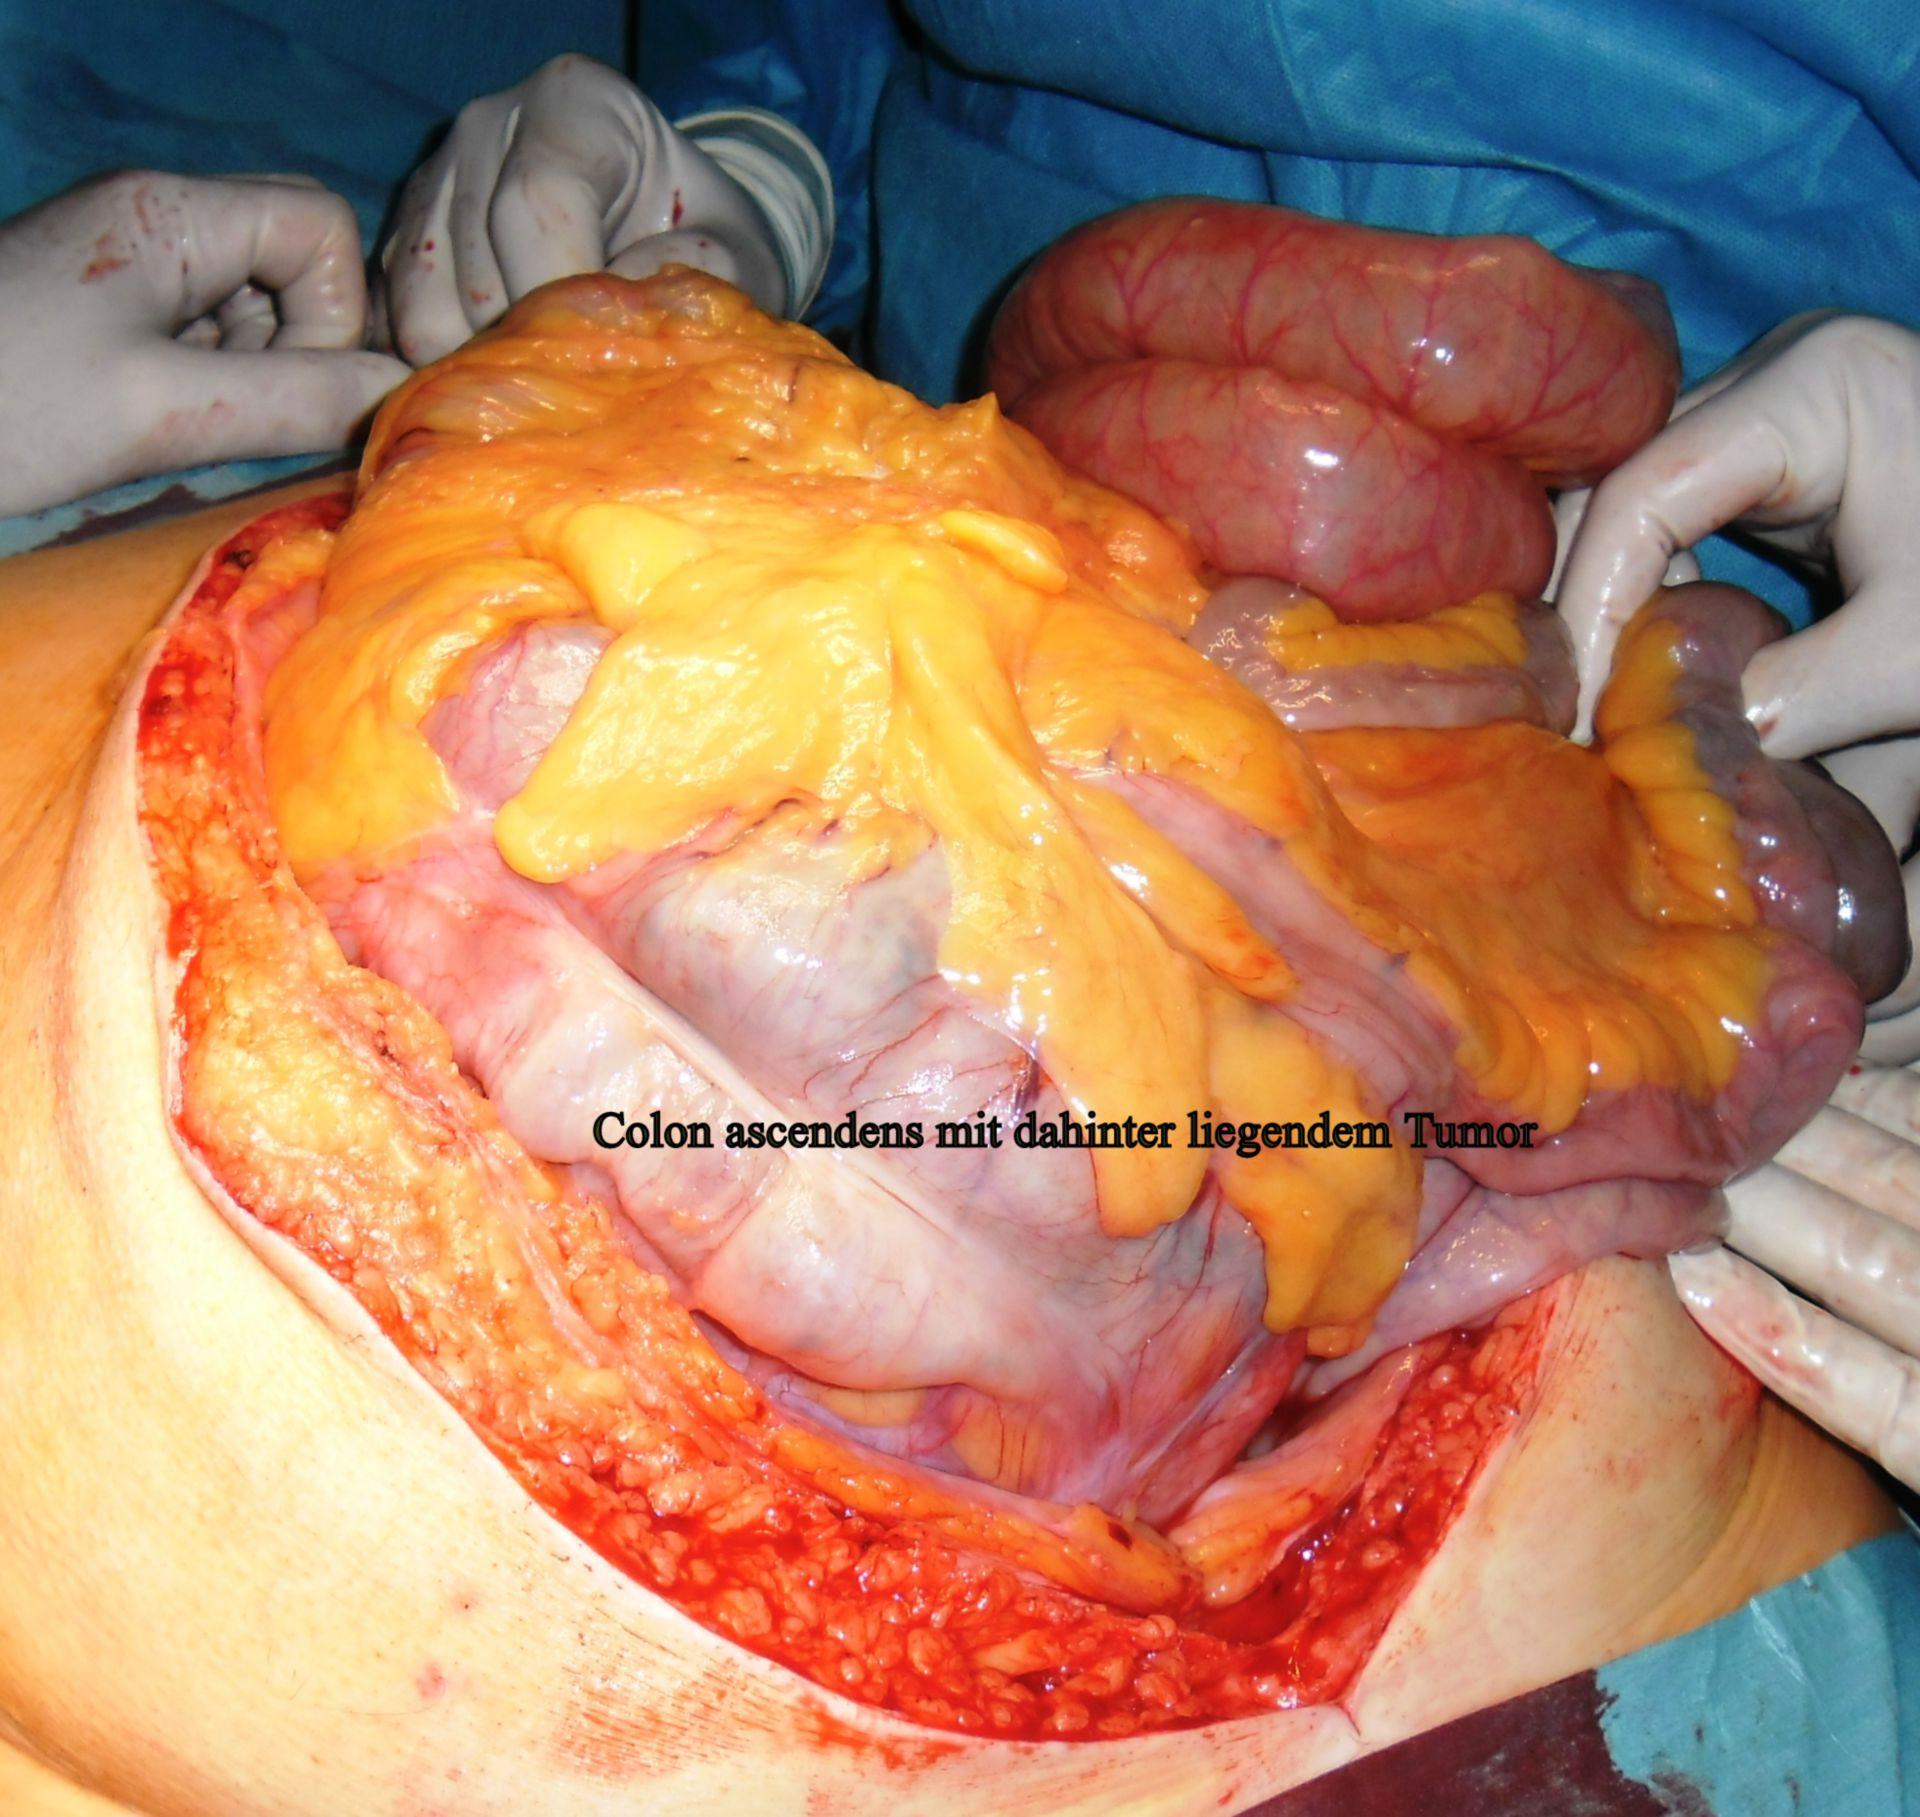 Resección de liposarcoma 1